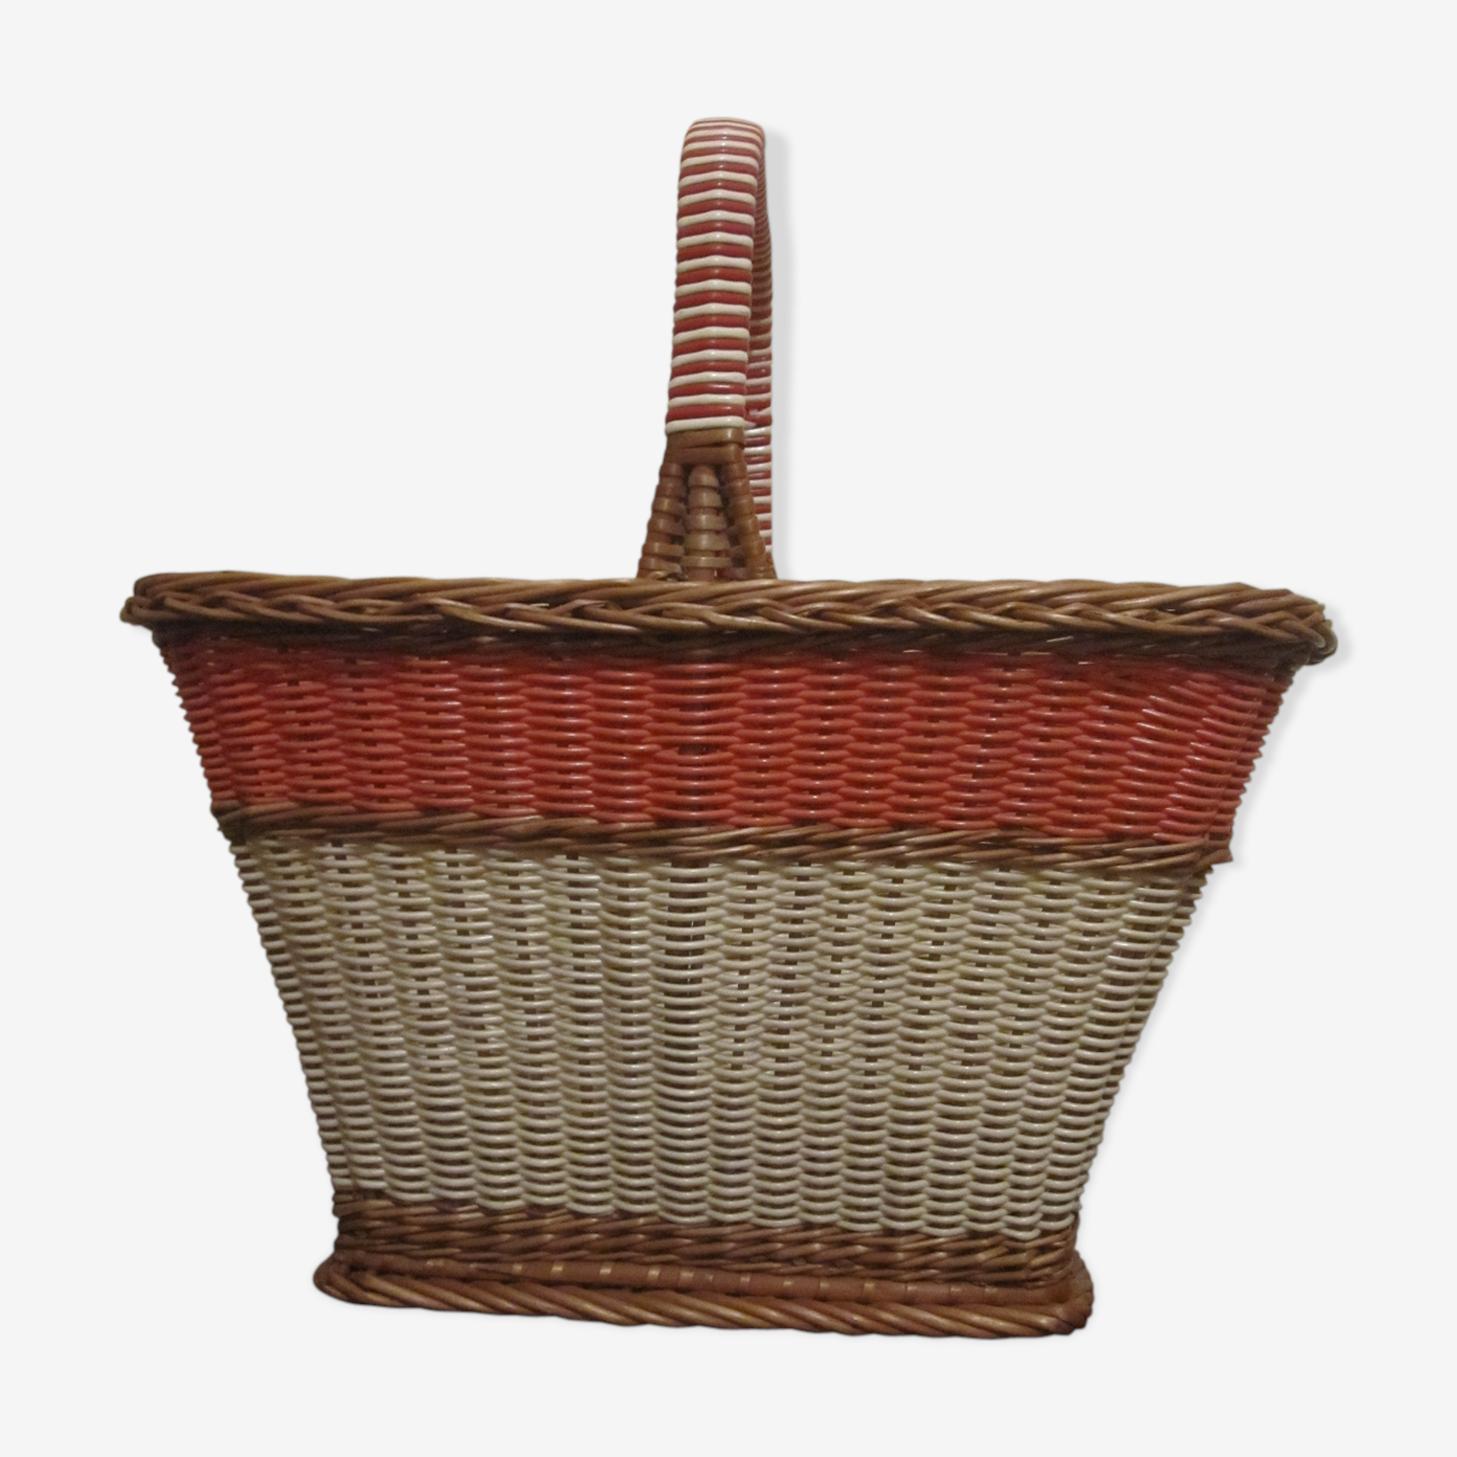 Scoubidou basket and rattan